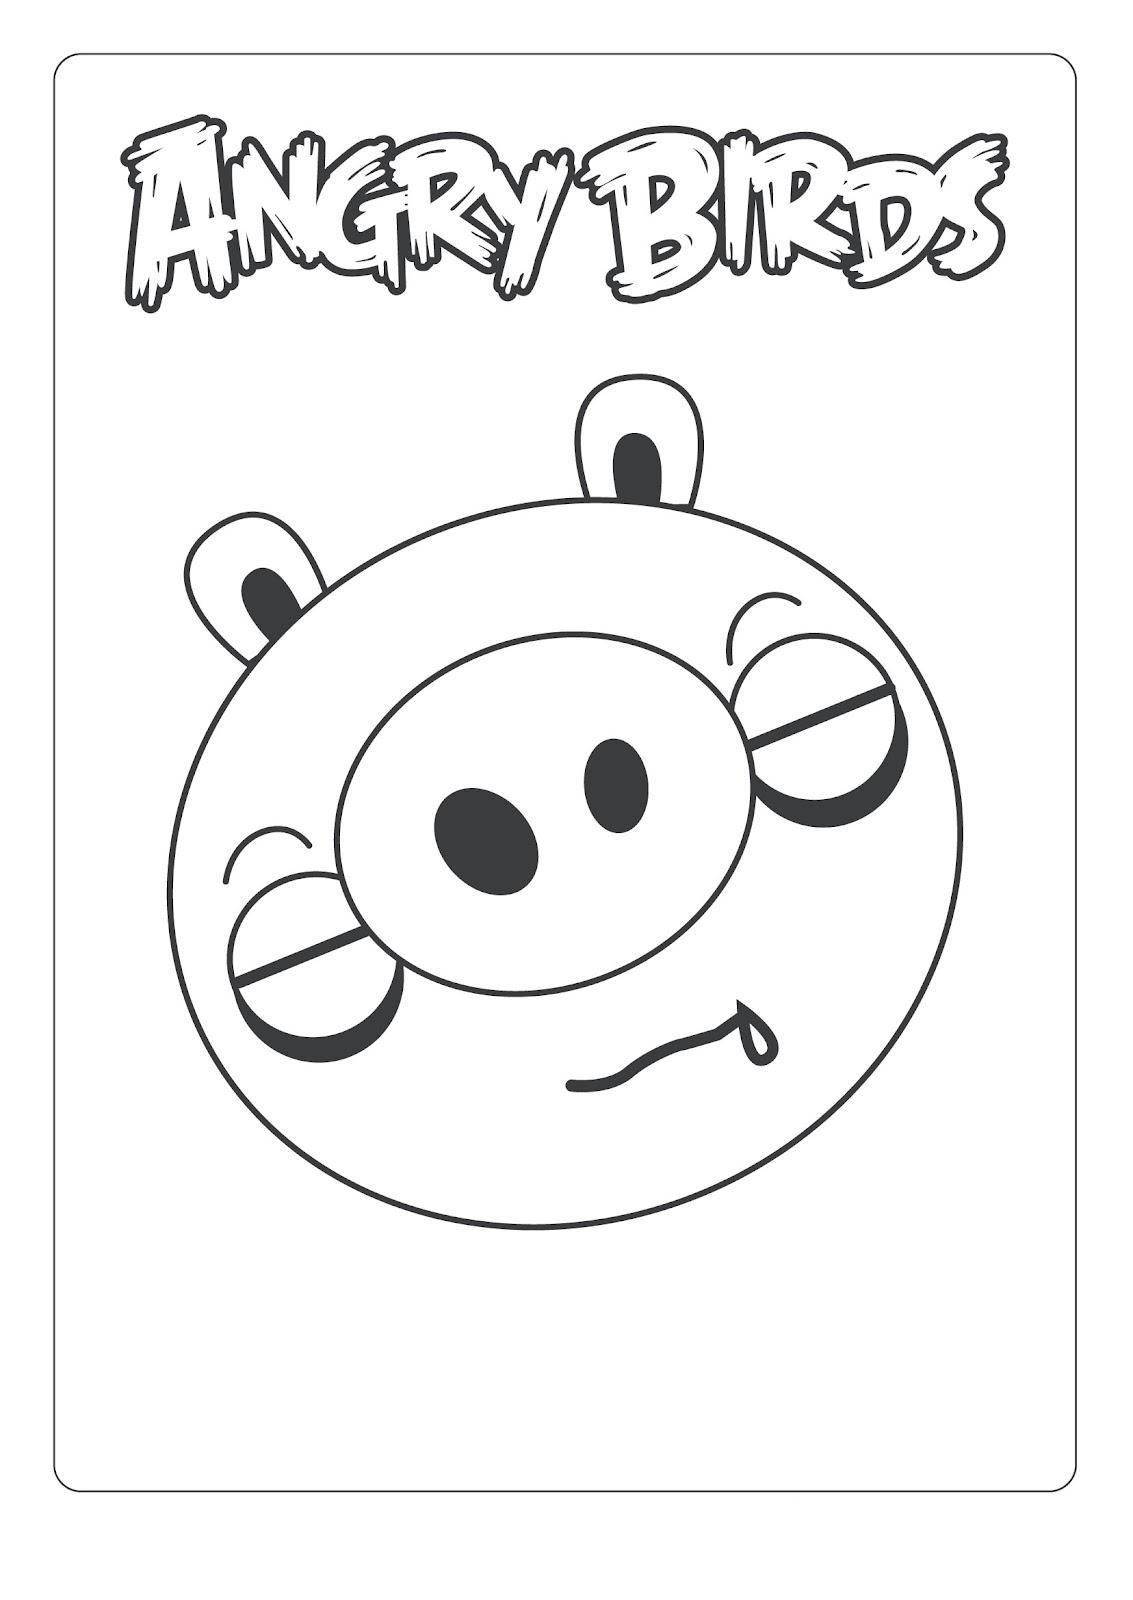 Dibujo para colorear de Bad Piggies: Minion Pig durmiendo